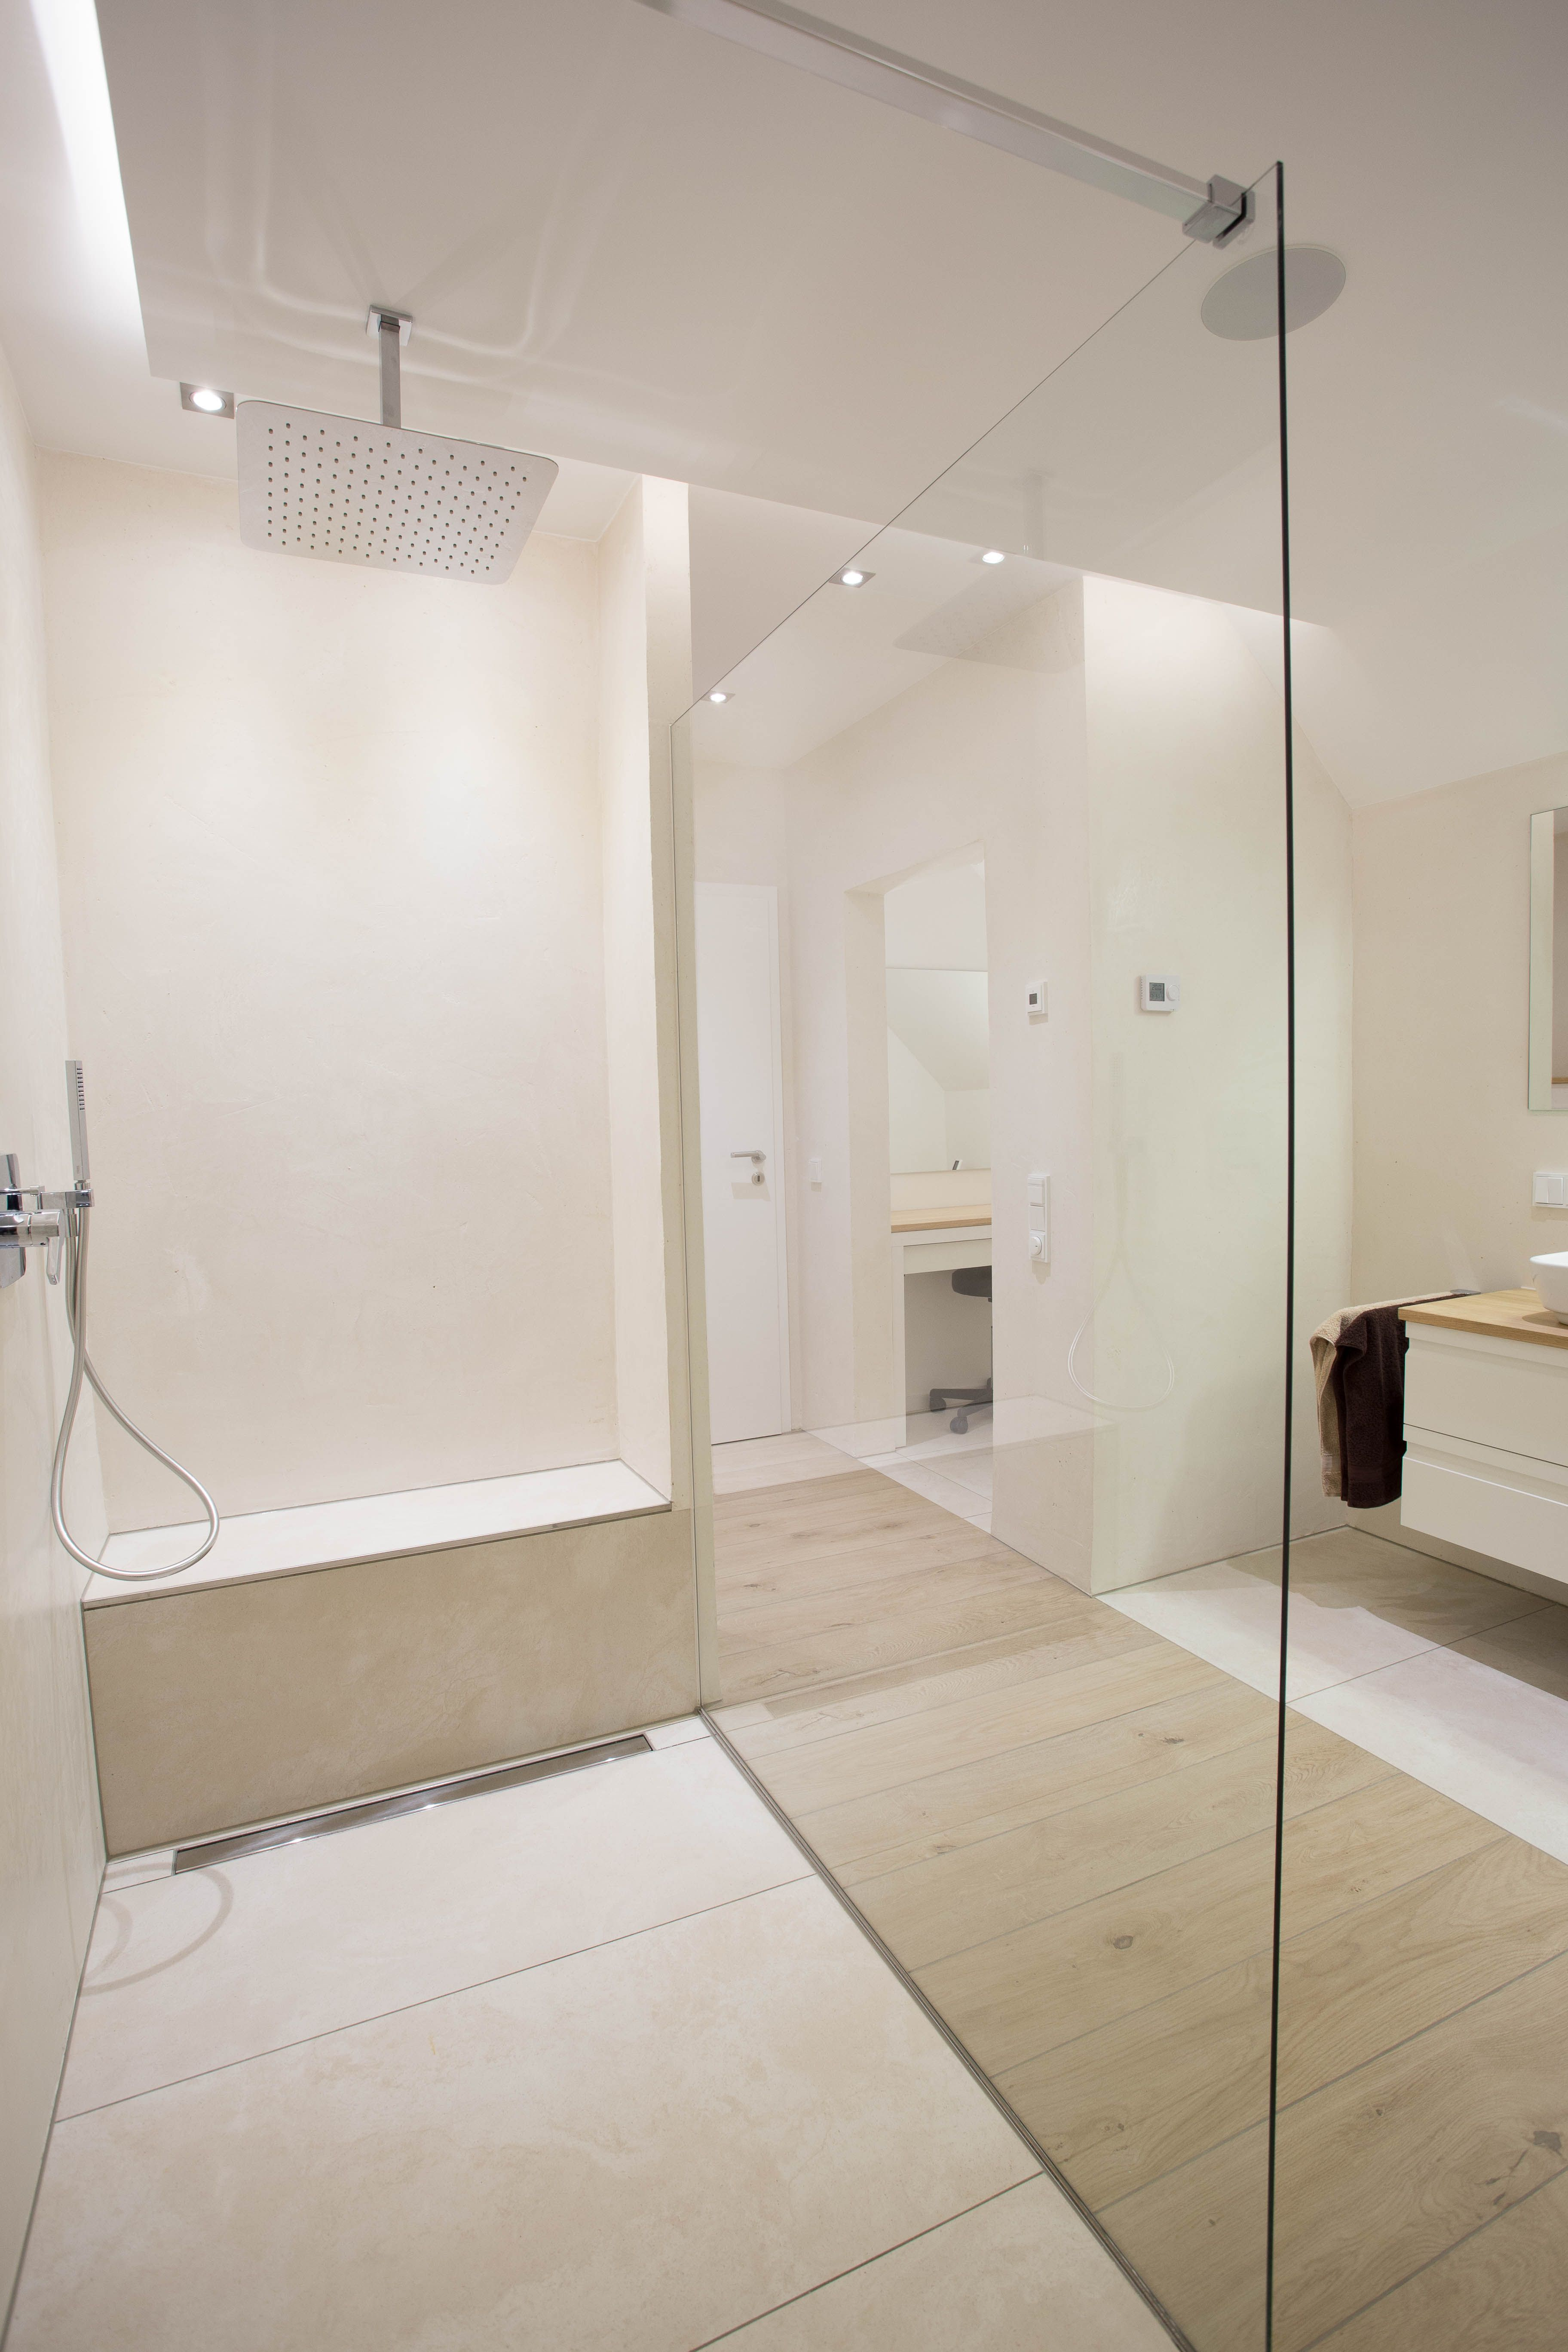 Mineralischer Edelputz In Fugenloser Dusche Dusche Renovieren Fugenlose Dusche Wohnung Renovierung